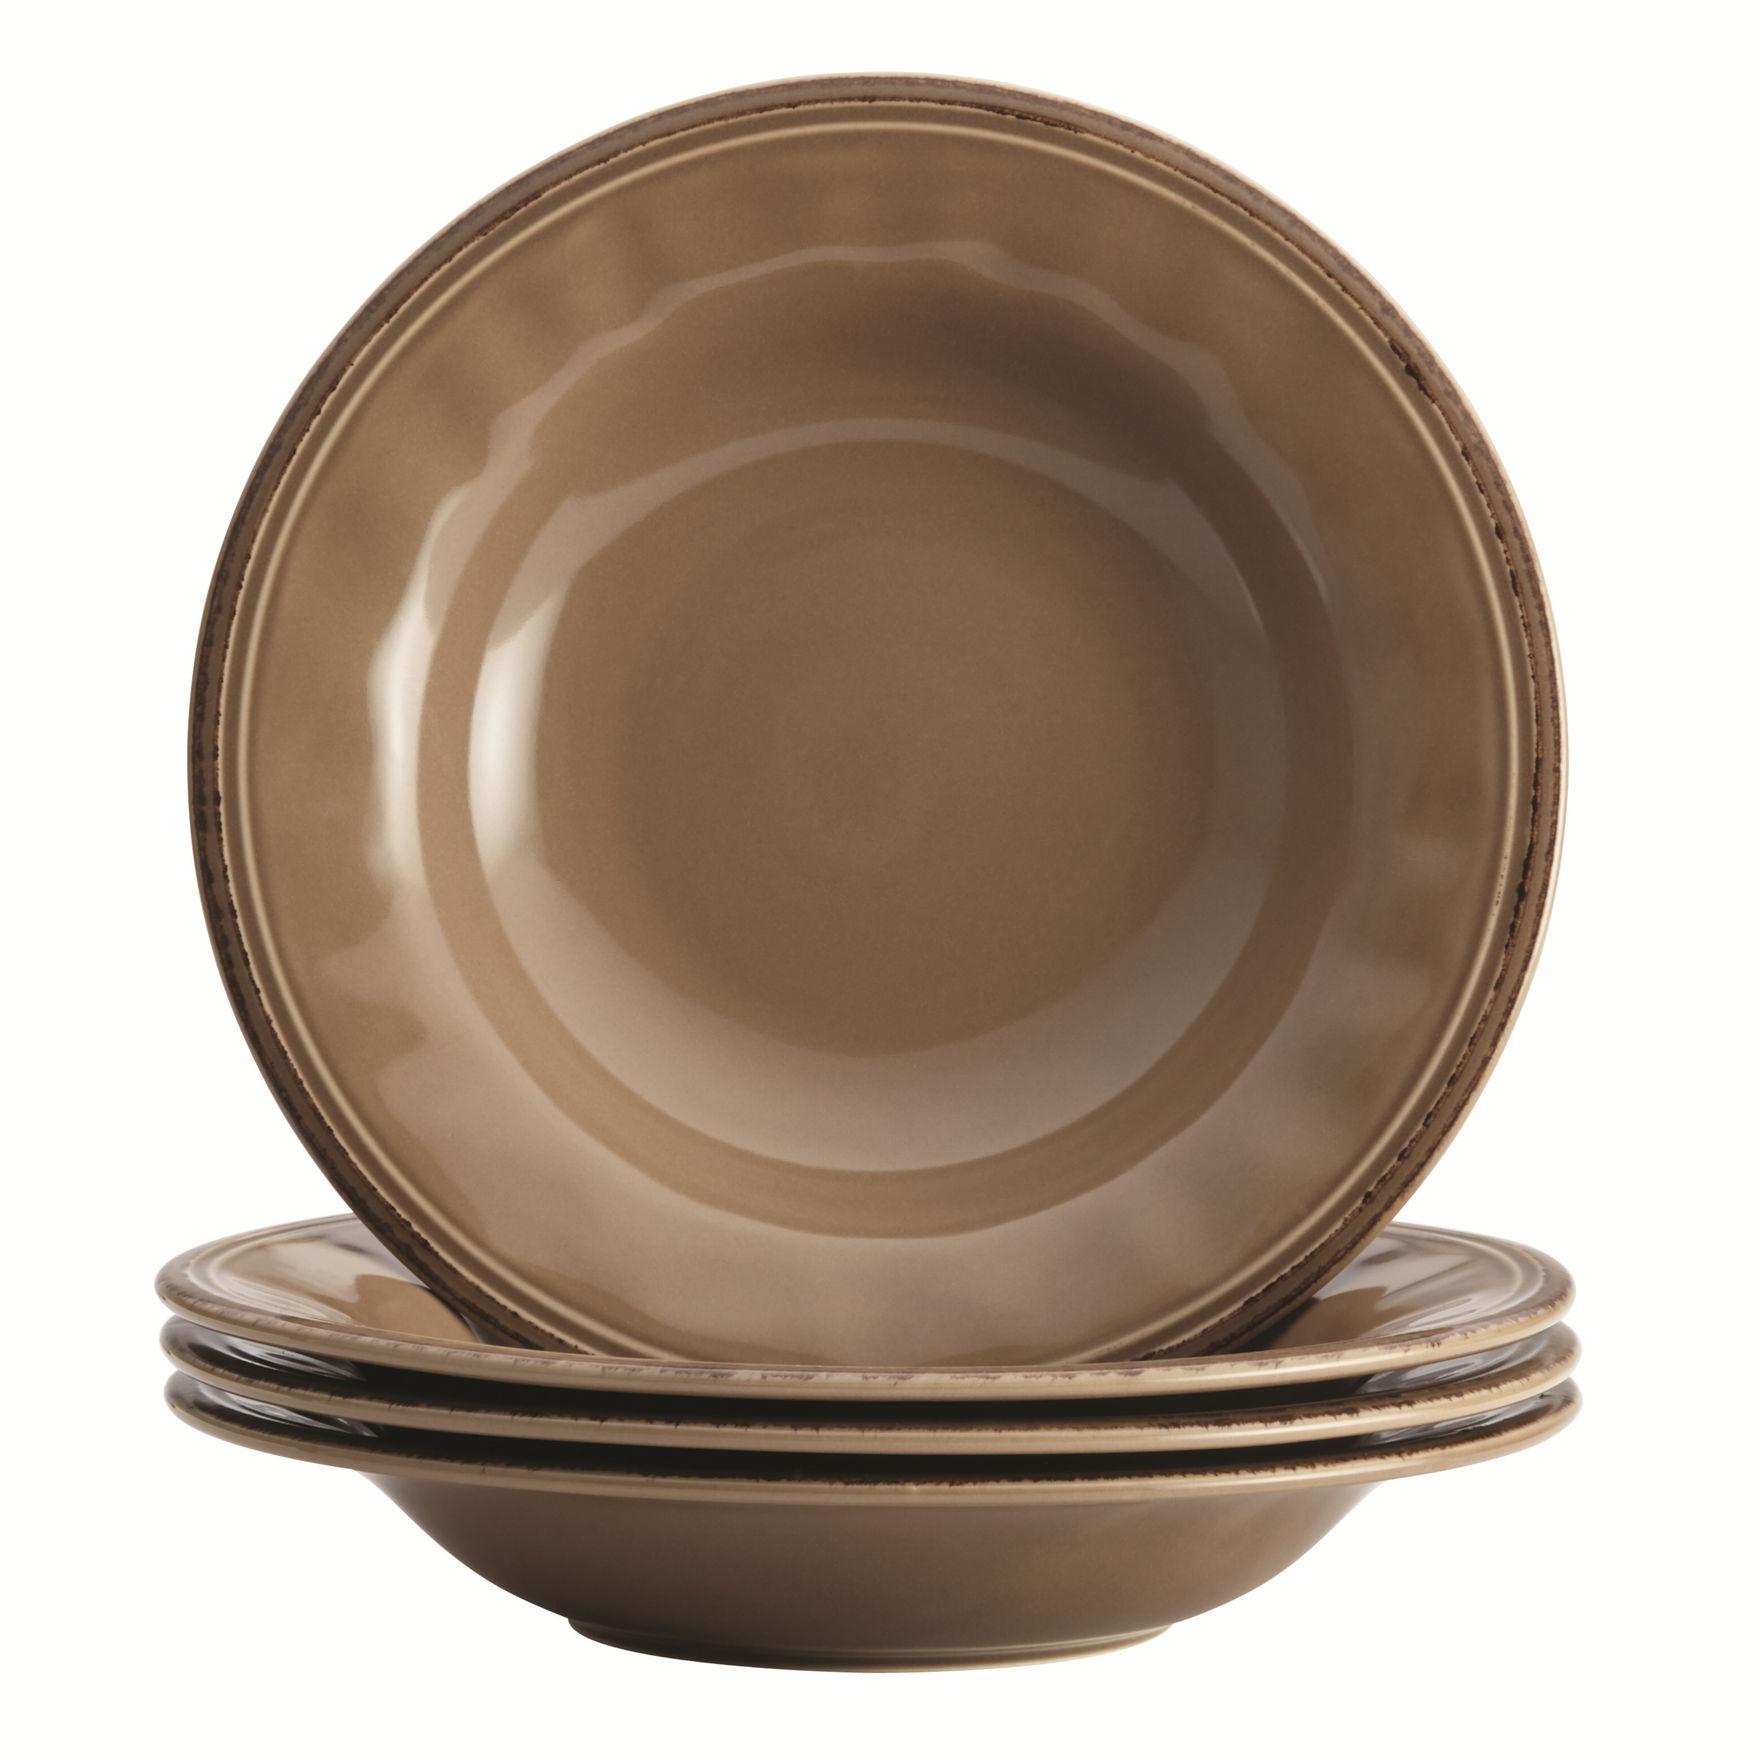 Rachael Ray Mushroom Bowls Dinnerware